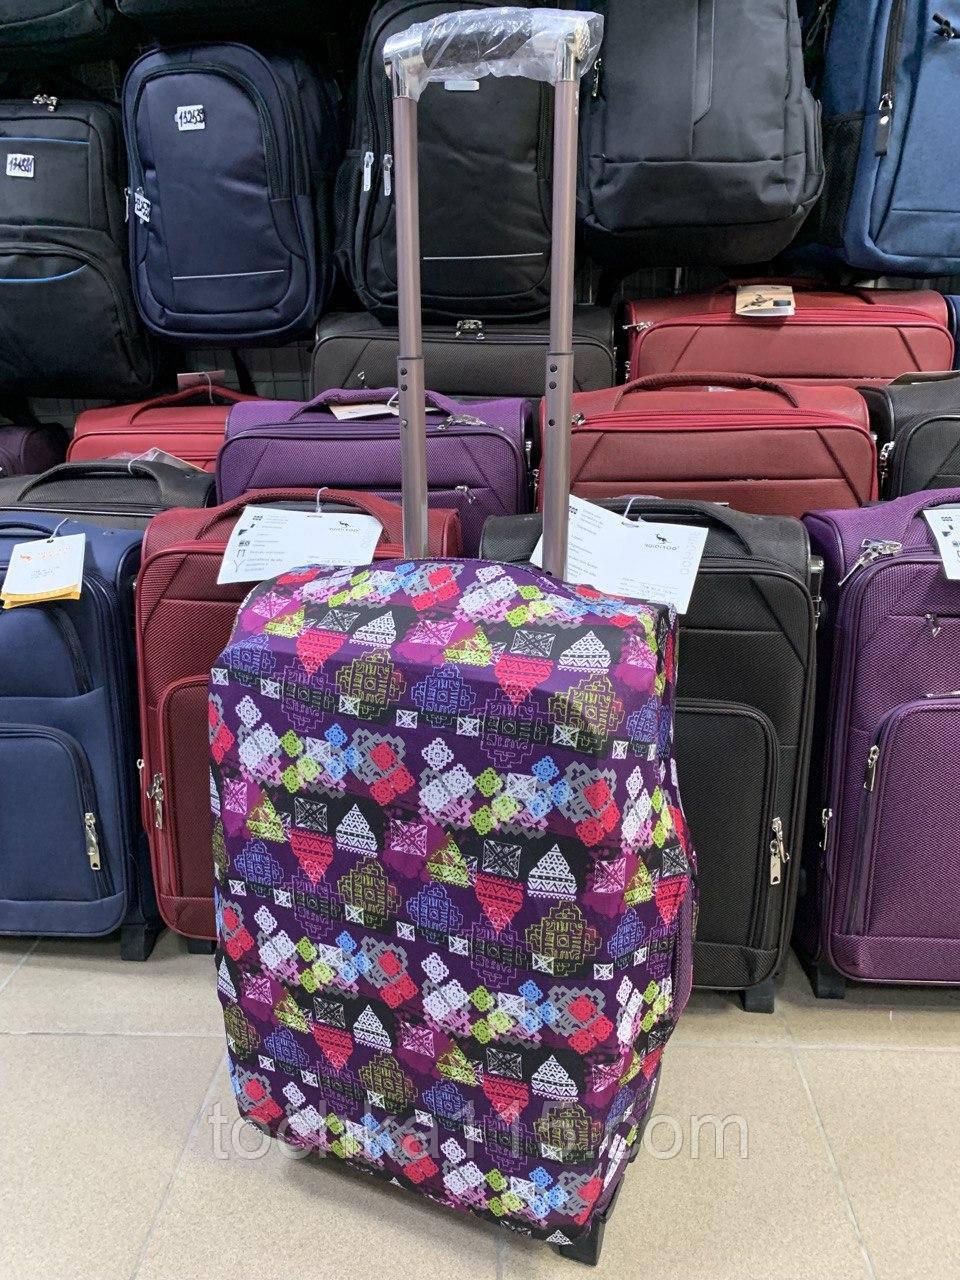 Чехол для чемодана до 65 см, чехол на средний чемодан размер М, яркий чехол принт на чемодан абстракция